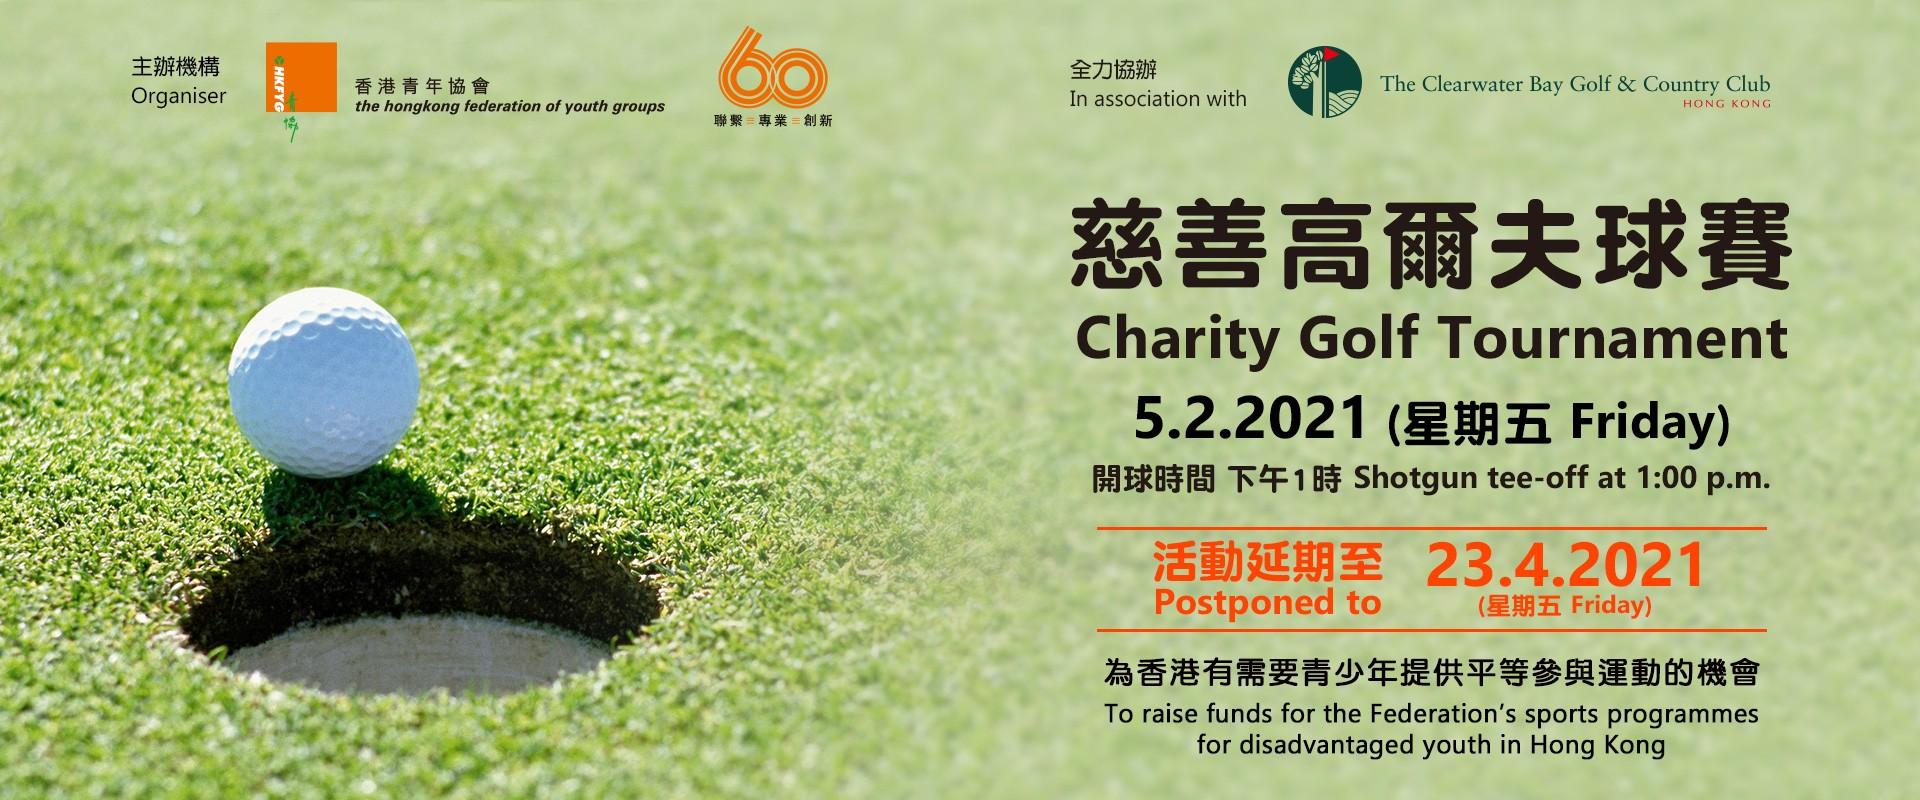 golf2020-web-banner